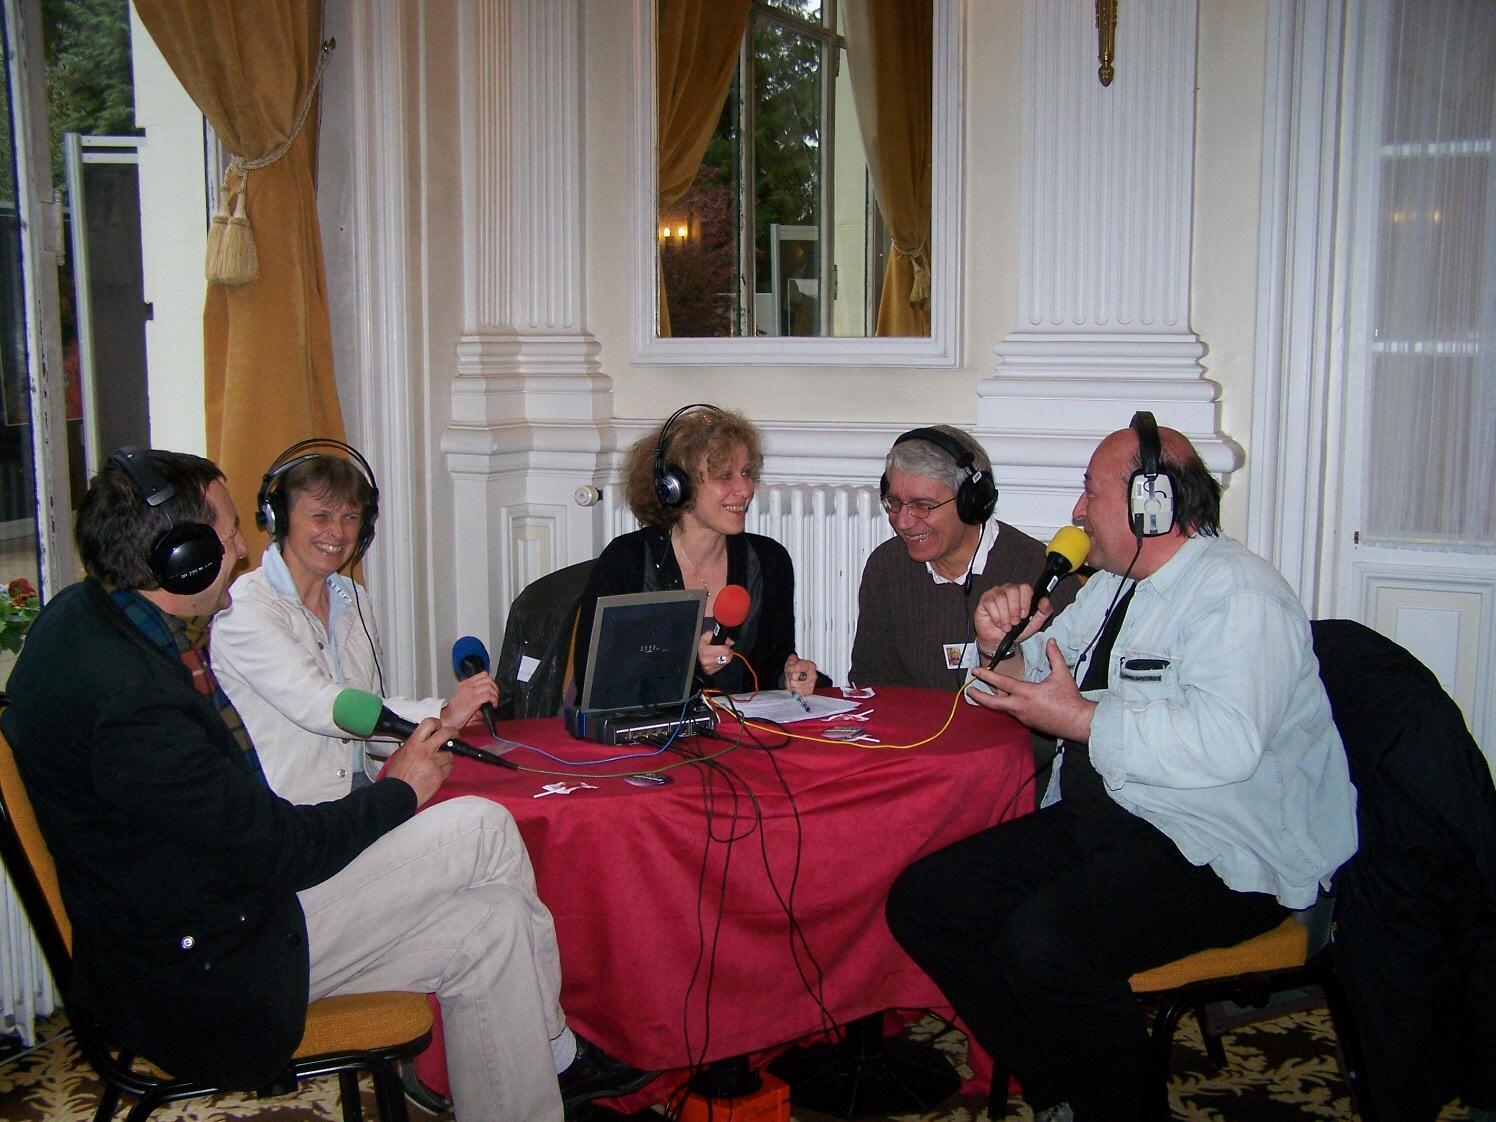 Jean-Marcel Dorioz, Anne Delestrade, Caroline Lachowsky, François Moutou et Pierre-Henri Gouyon